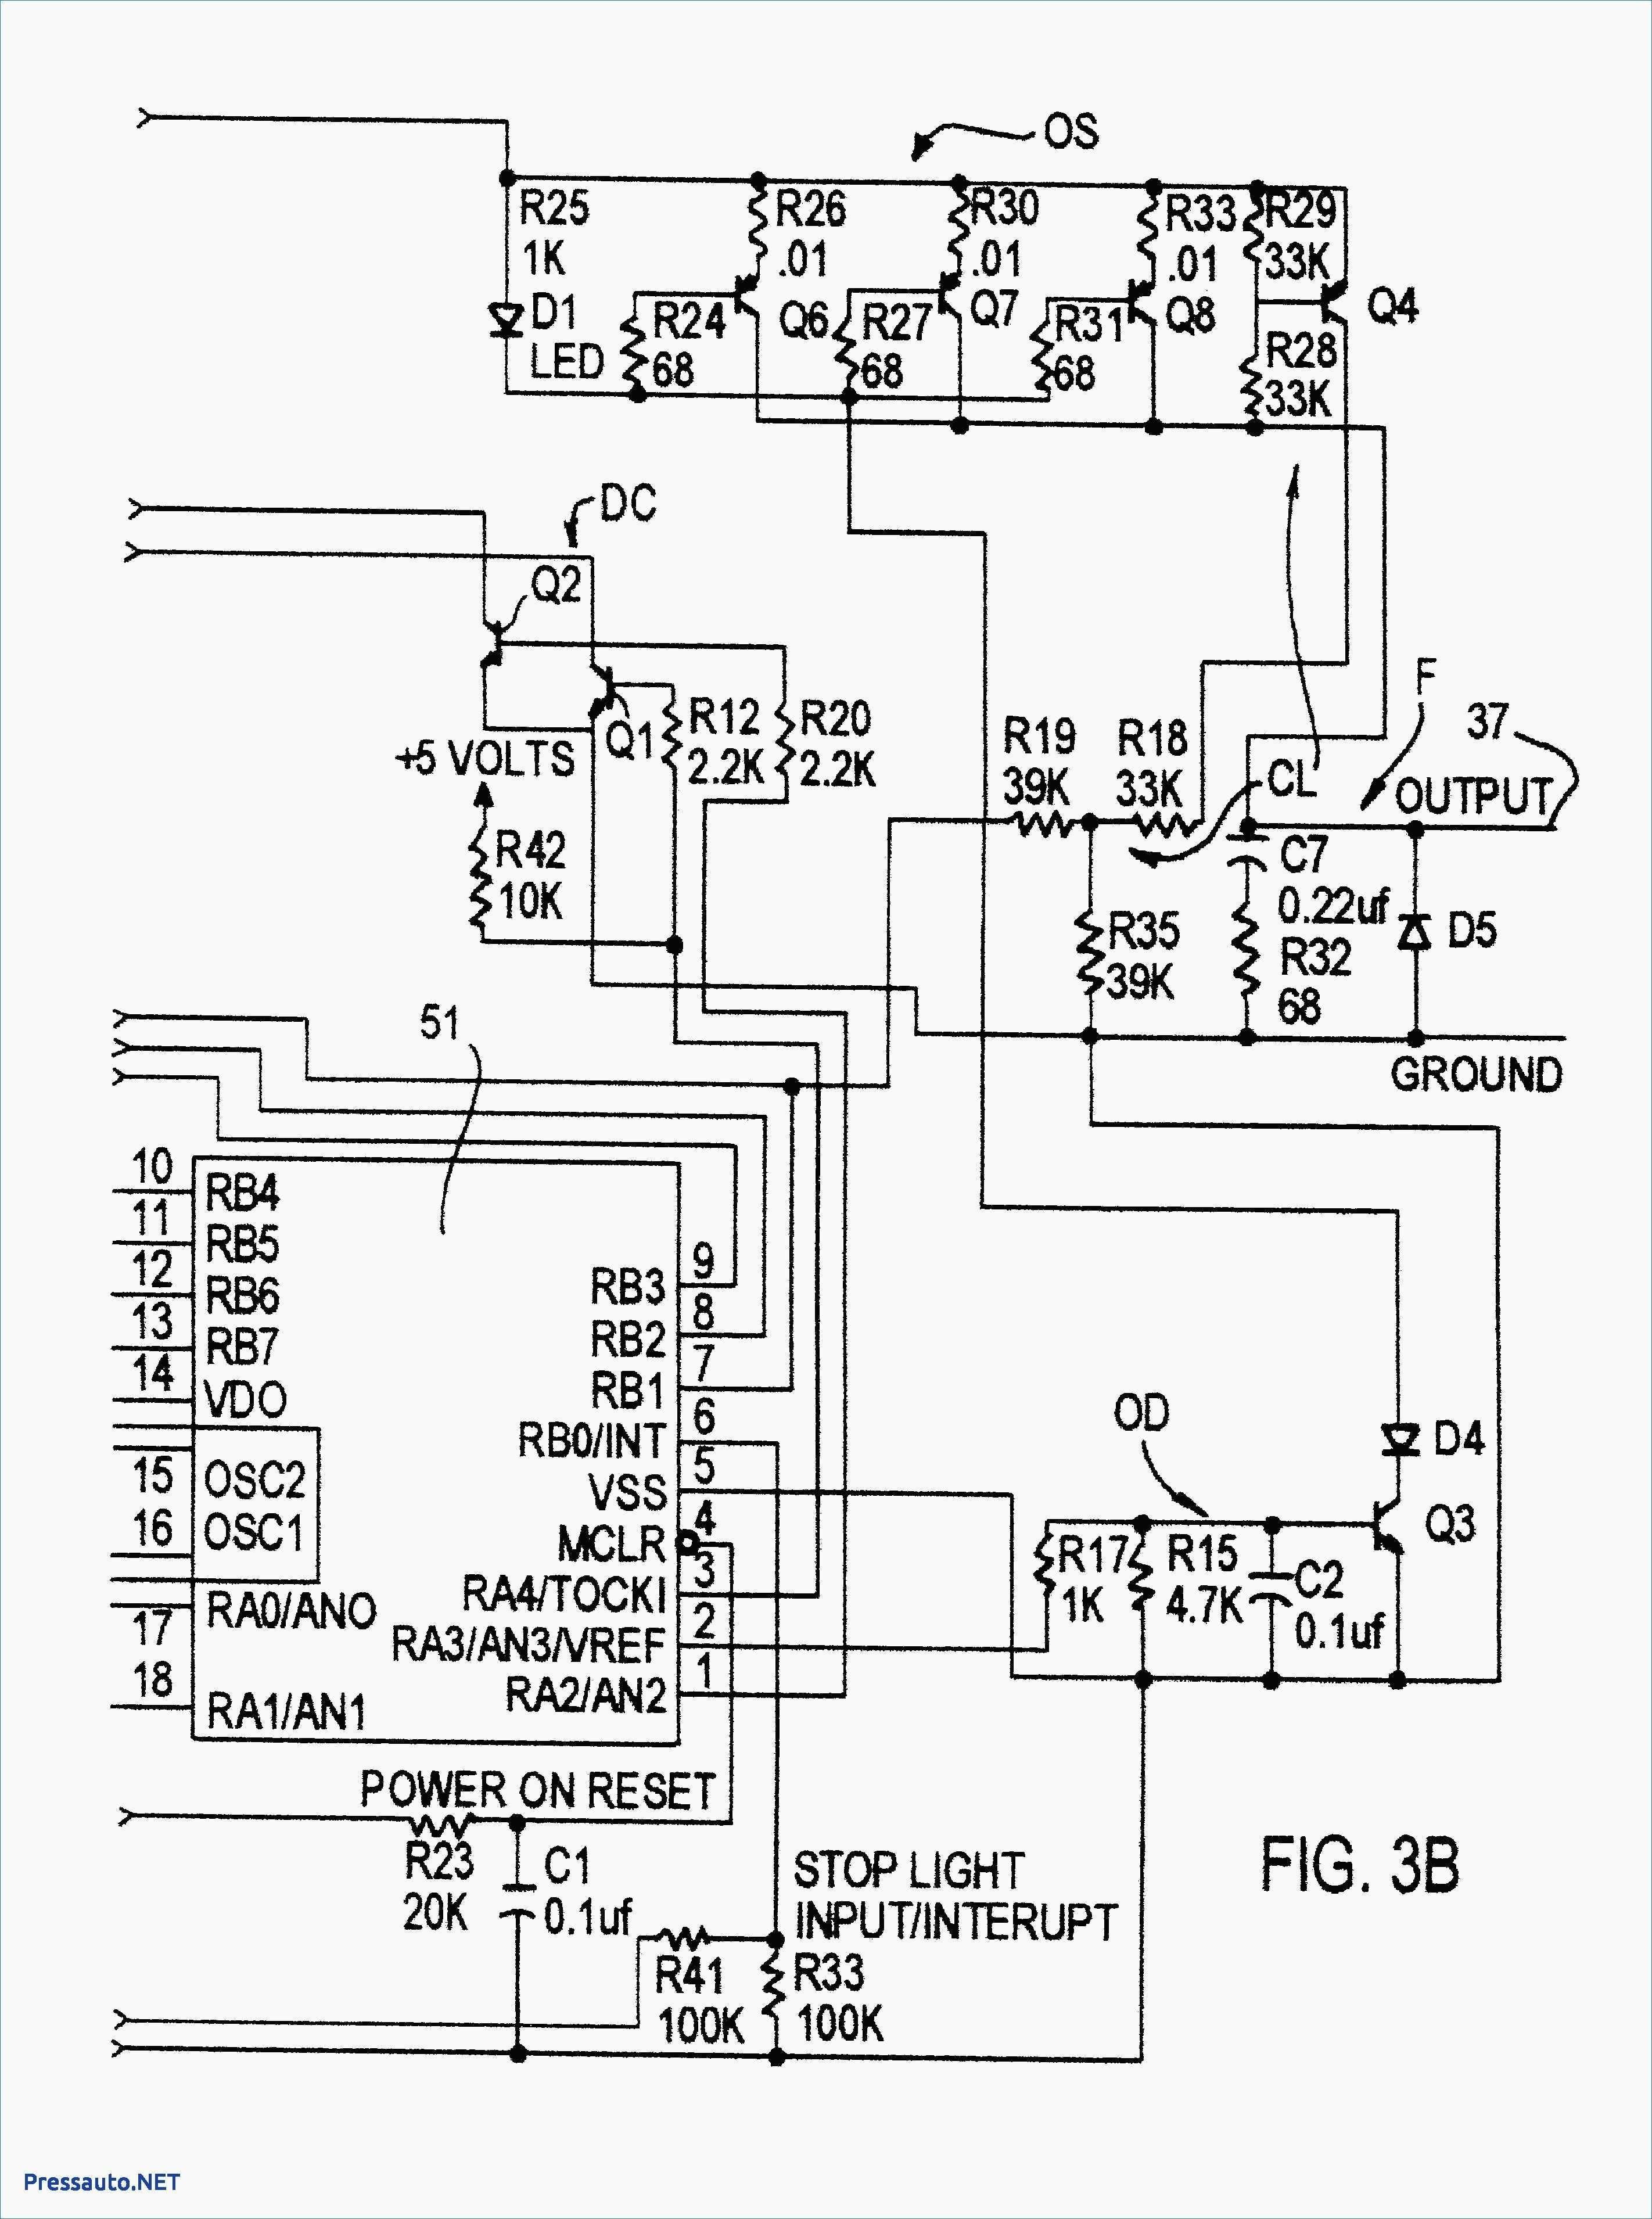 Nissan Titan Trailer Wiring Diagram Jasco 65tdm R Alternator Wiring Diagram Wiring Diagram Paper Of Nissan Titan Trailer Wiring Diagram